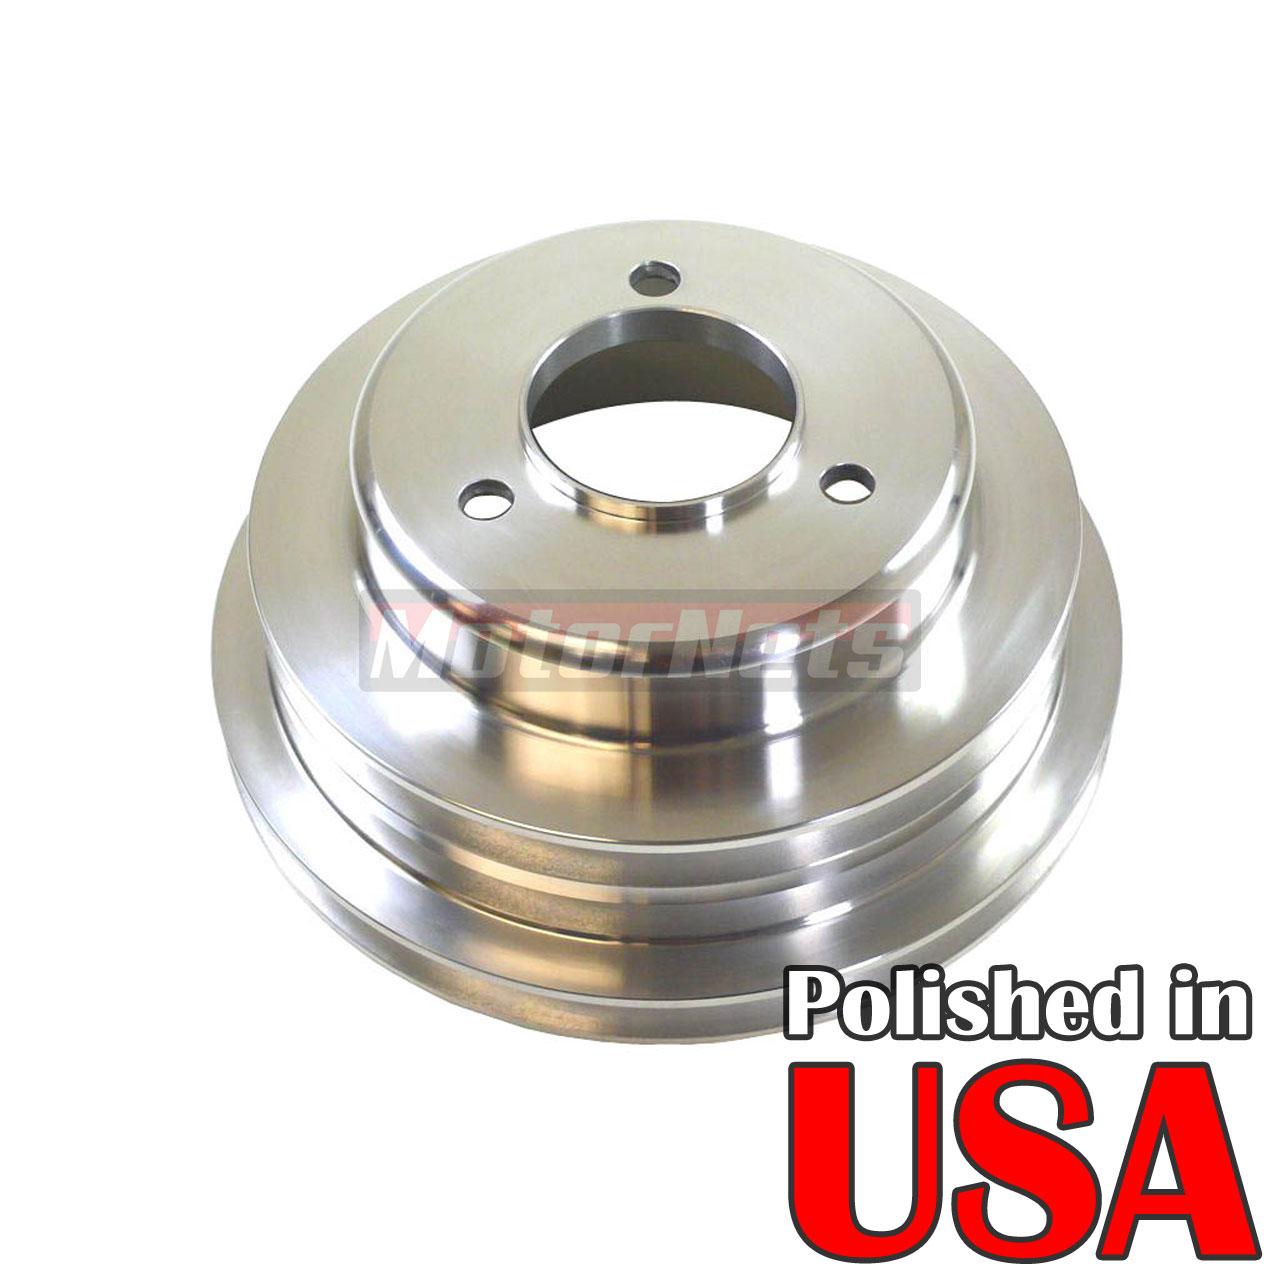 Polished Aluminum BBC Chevy 396-454 Crankshaft Pulley 3